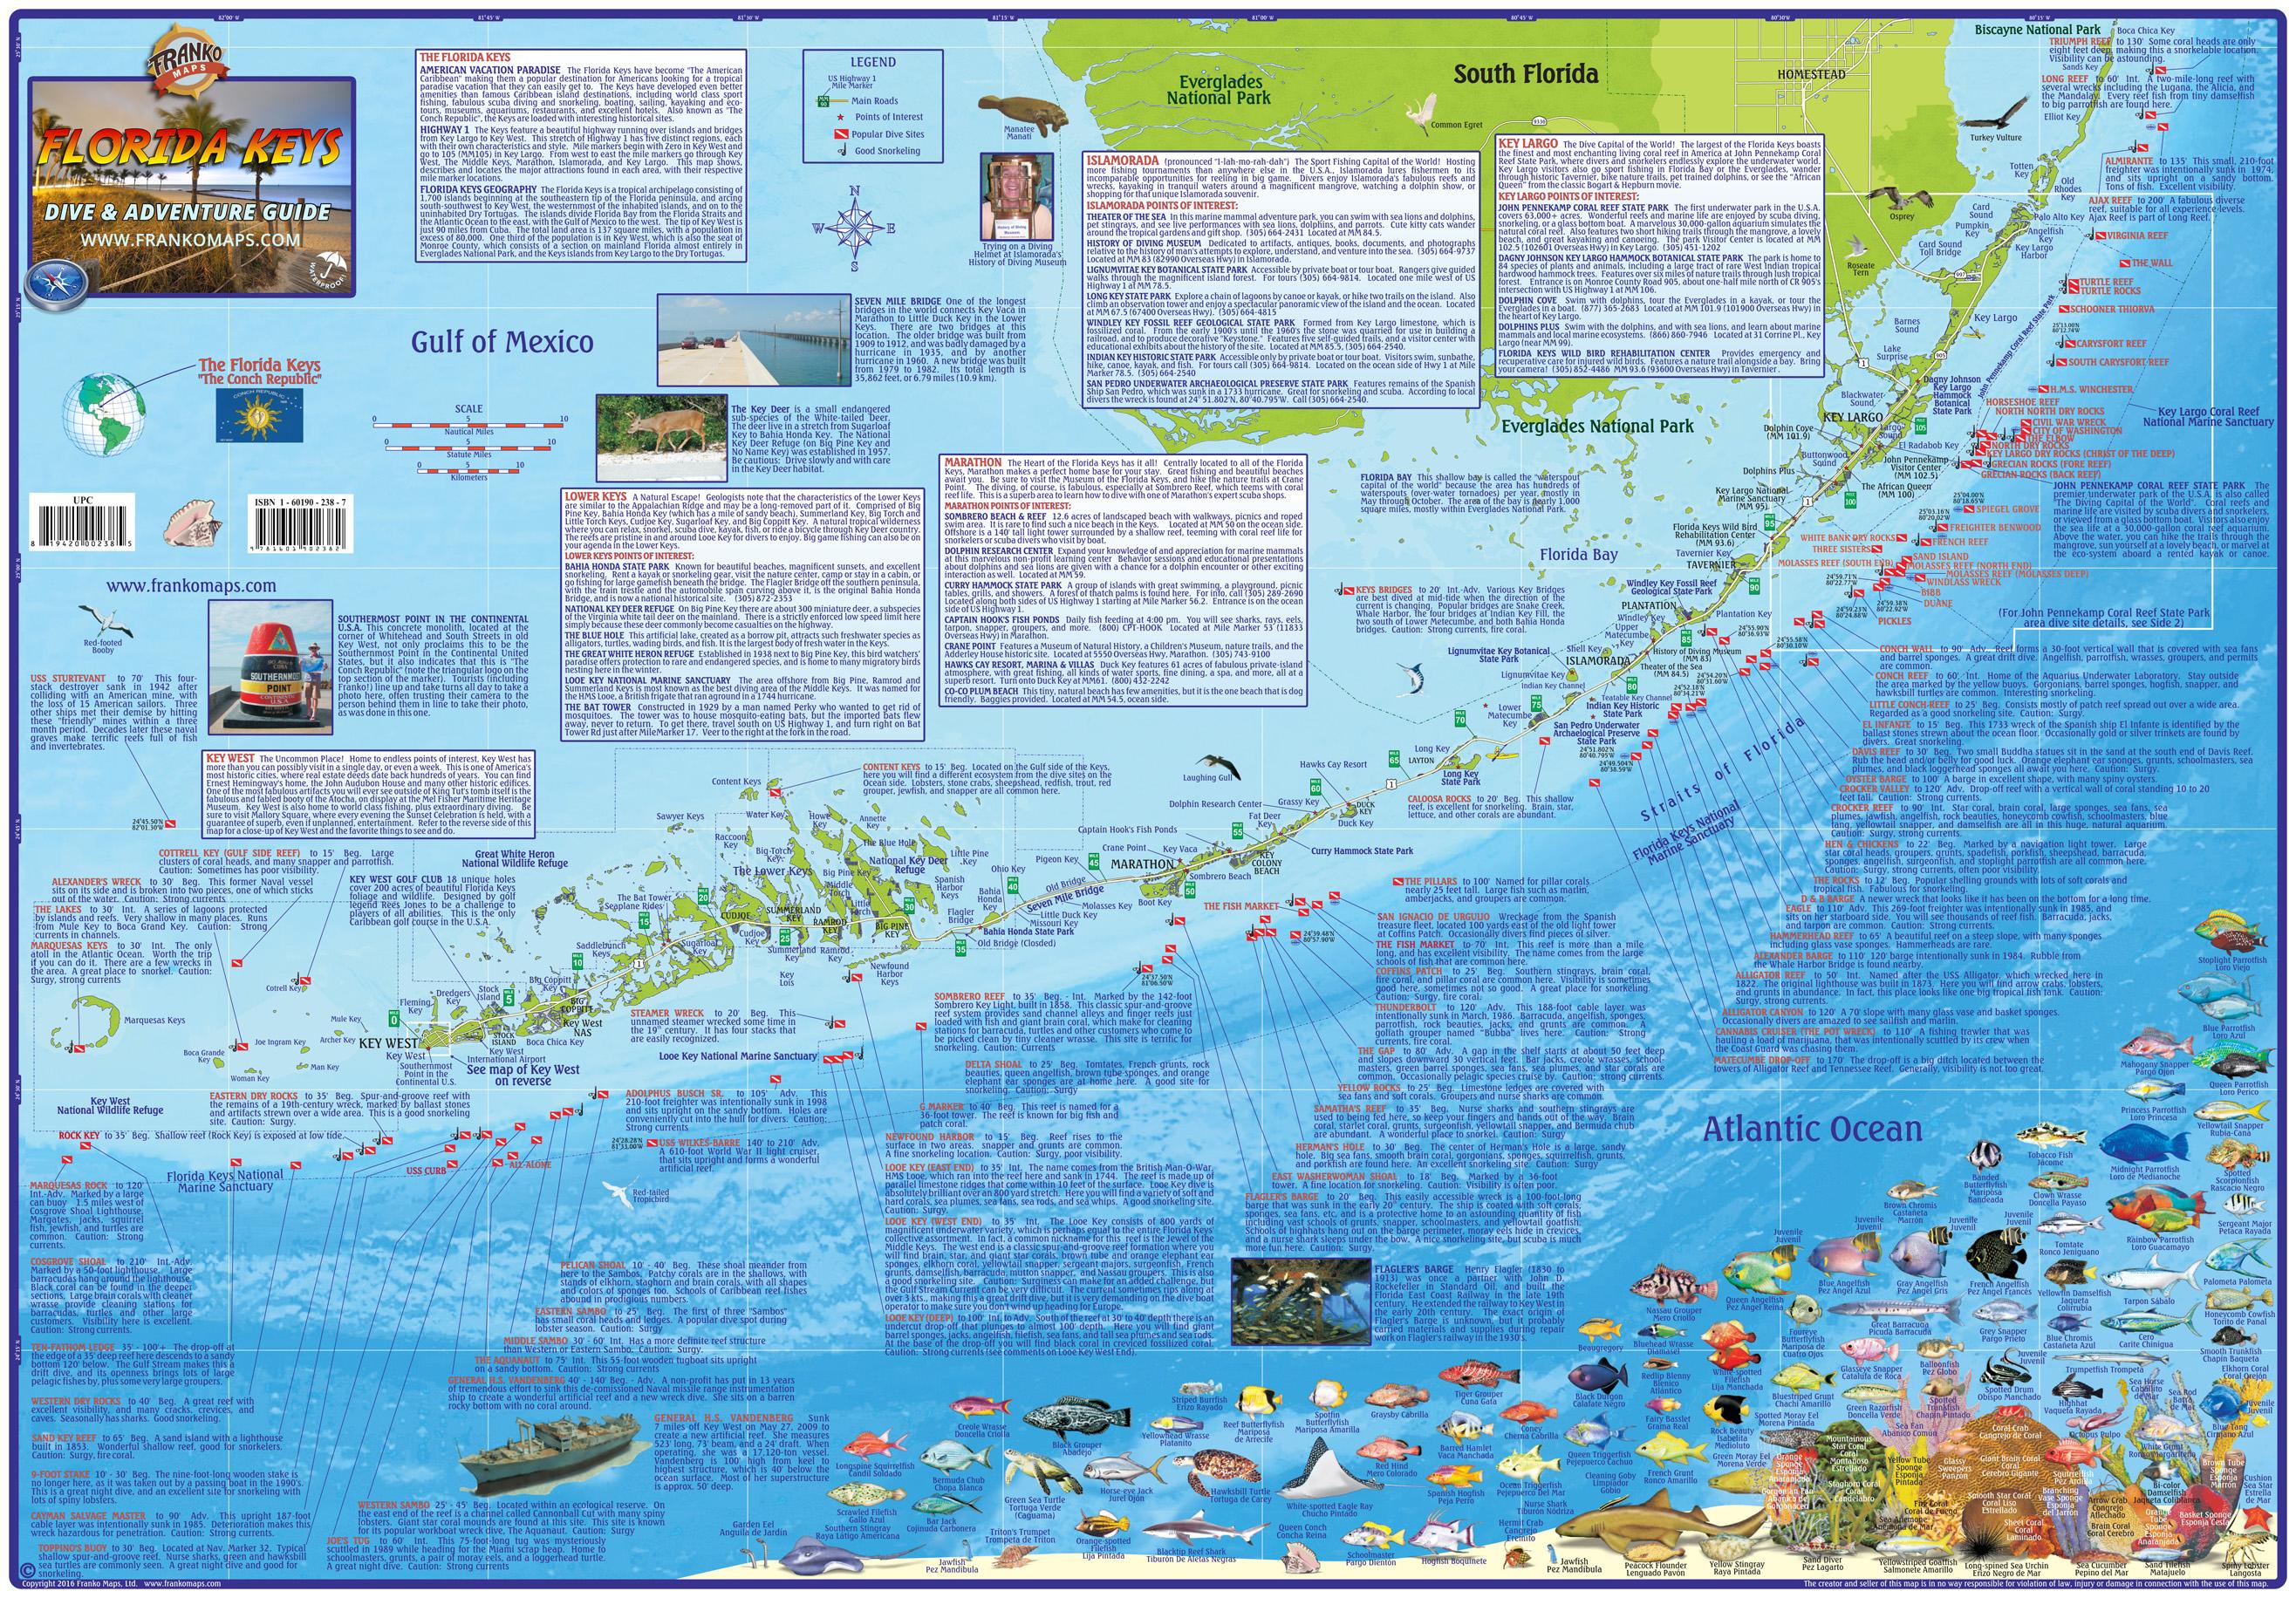 Franko Maps Florida Keys Guide & Dive Map - Florida Keys Dive Map